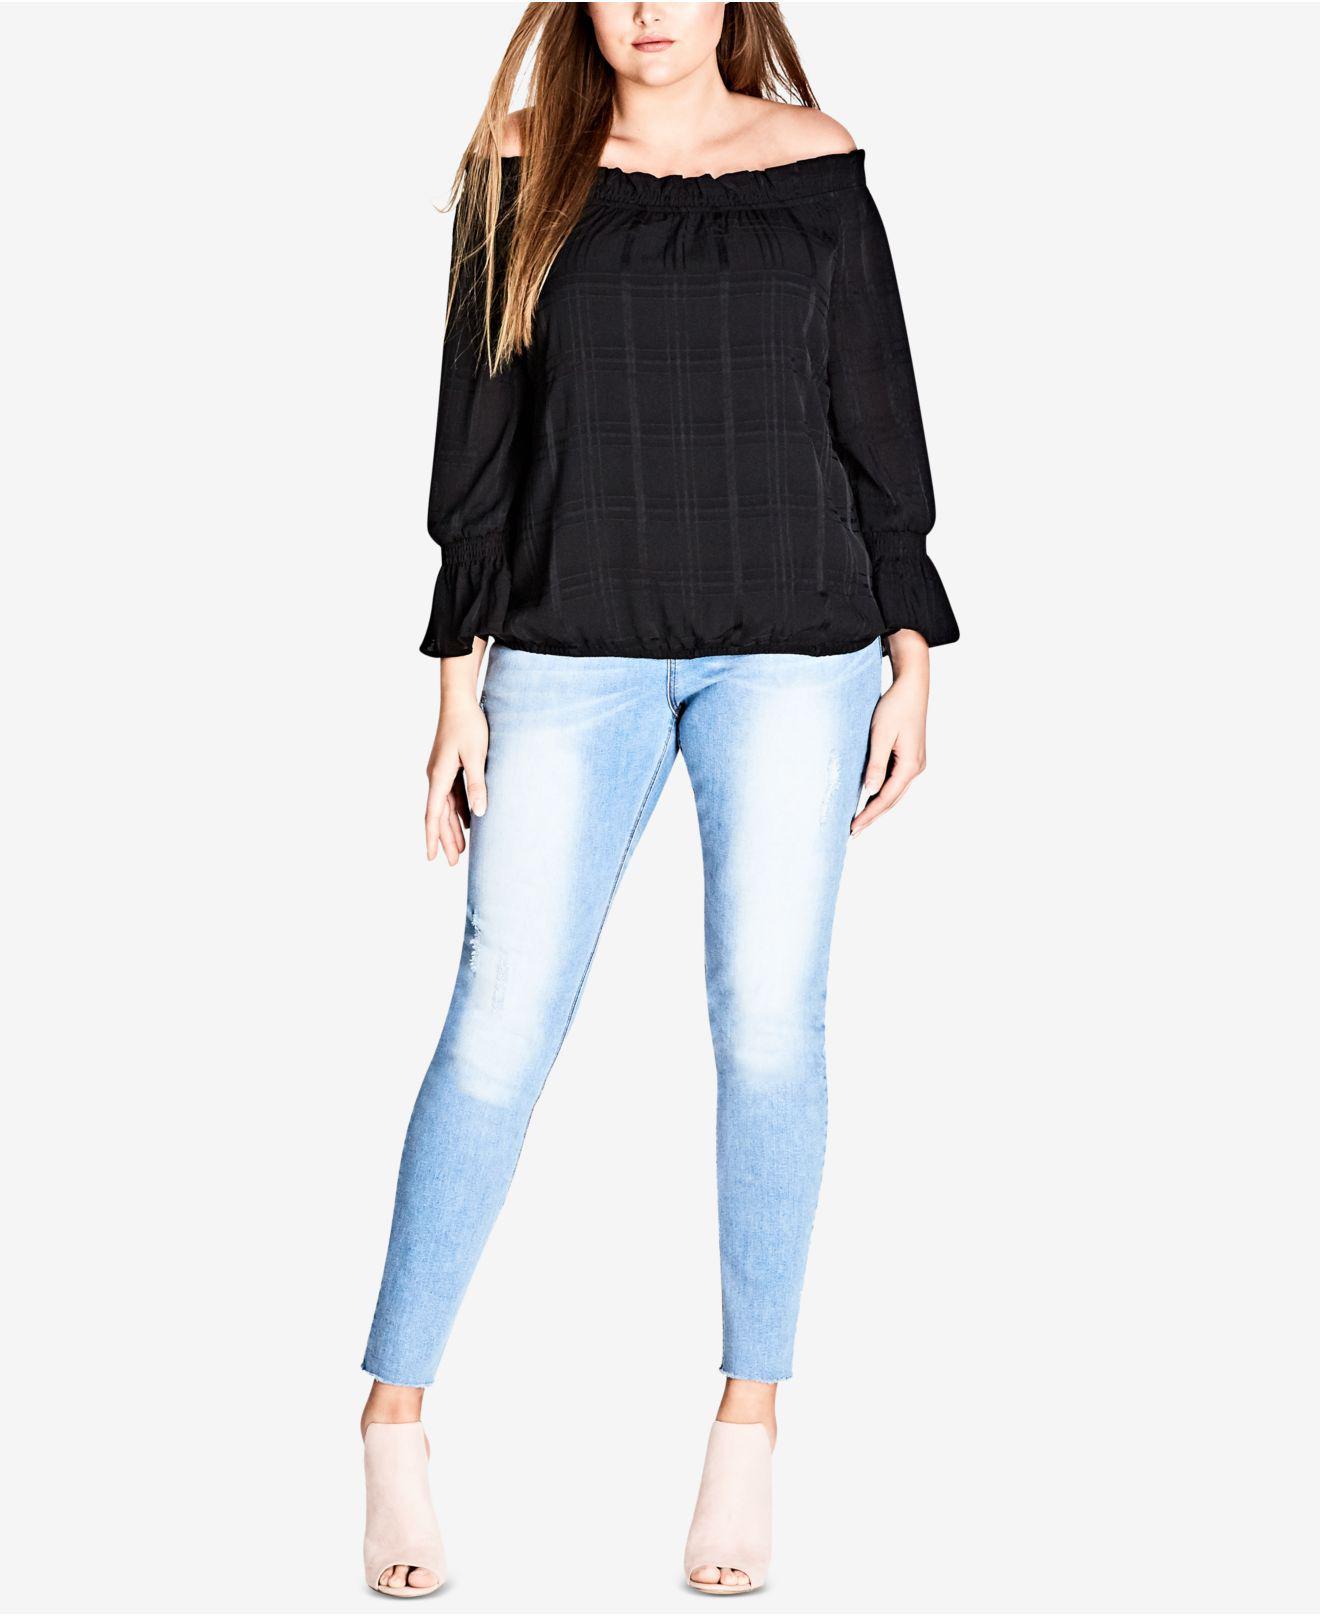 Women's Plus Size Clothing Australia's online fashion destination for plus. a collection of the latest plus size ladies clothing for the trendy Australian woman. Autograph is an Australian based fashion site for plus-sized women.